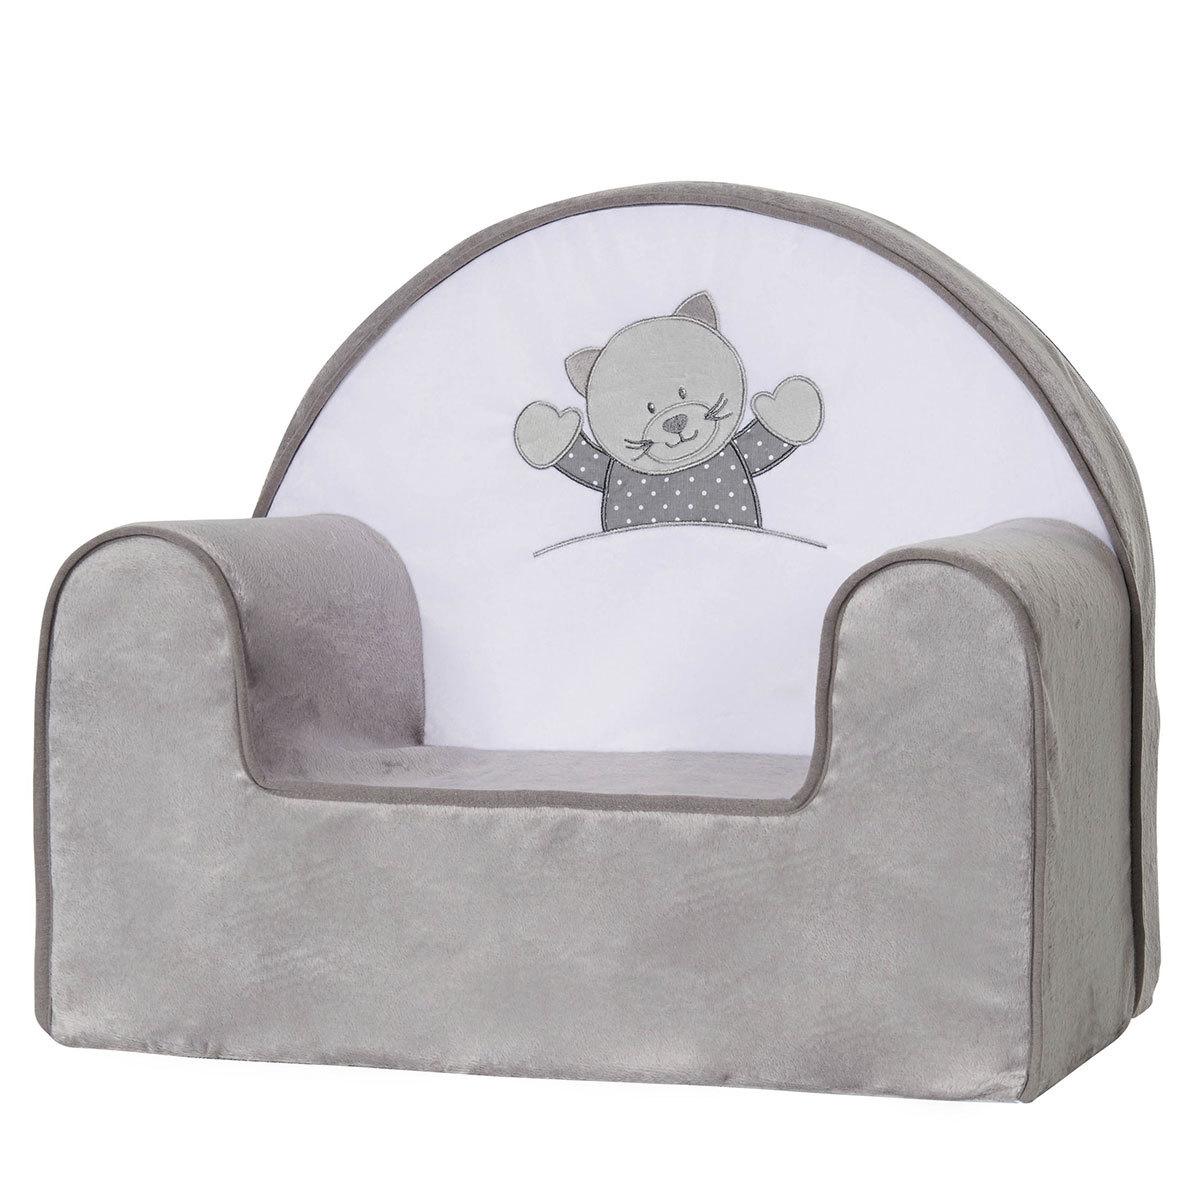 fauteuil d 39 enfant tineo fauteuil chaton. Black Bedroom Furniture Sets. Home Design Ideas